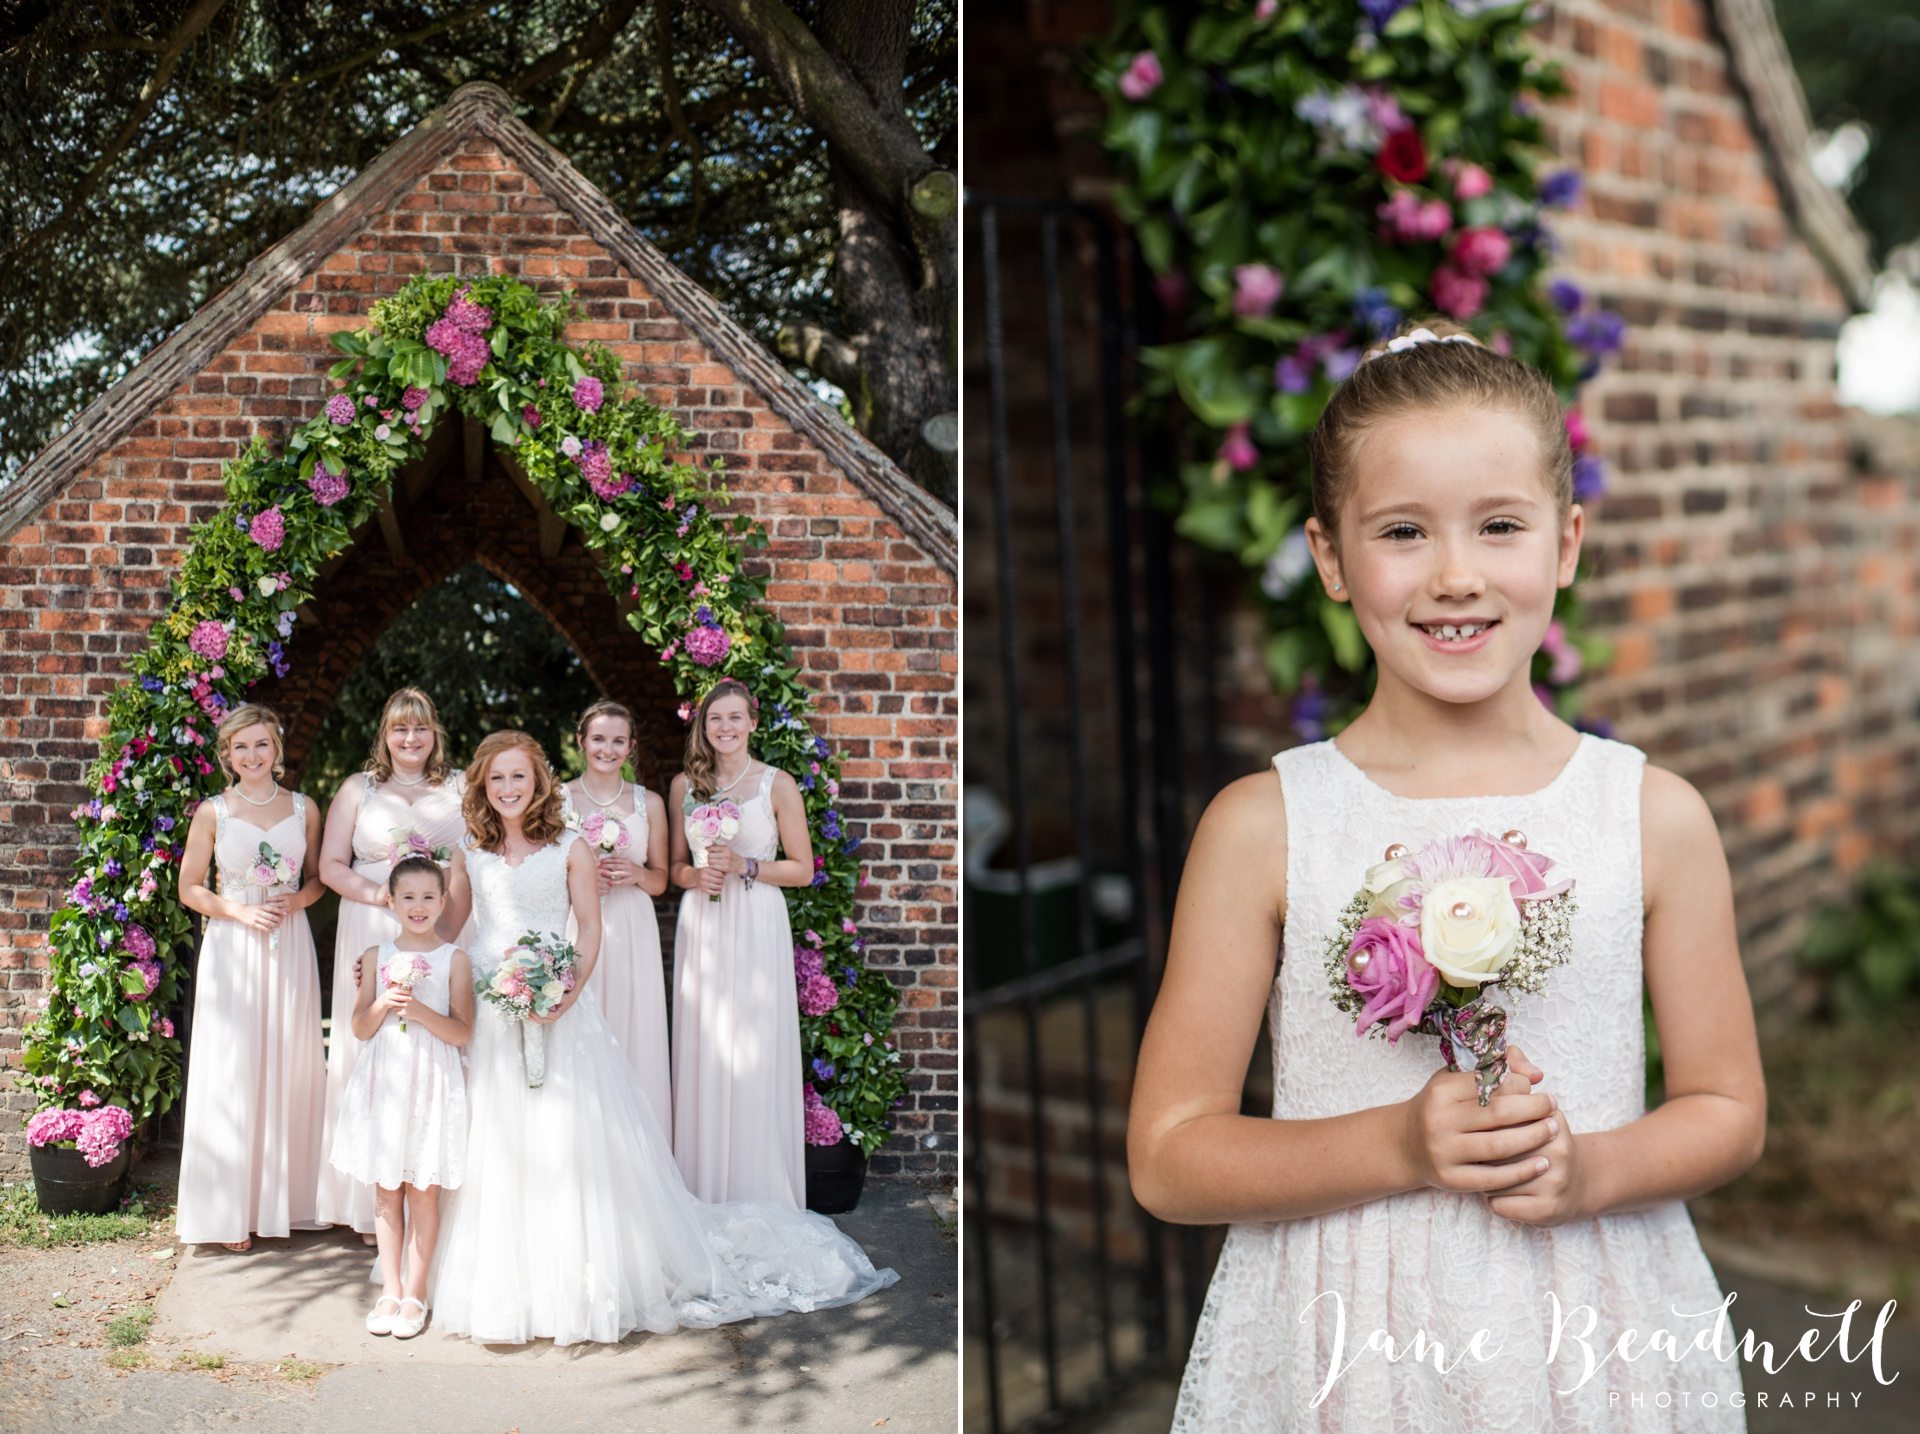 yorkshire-fine-art-wedding-photographer-jane-beadnell-photography-poppleton-york_0030